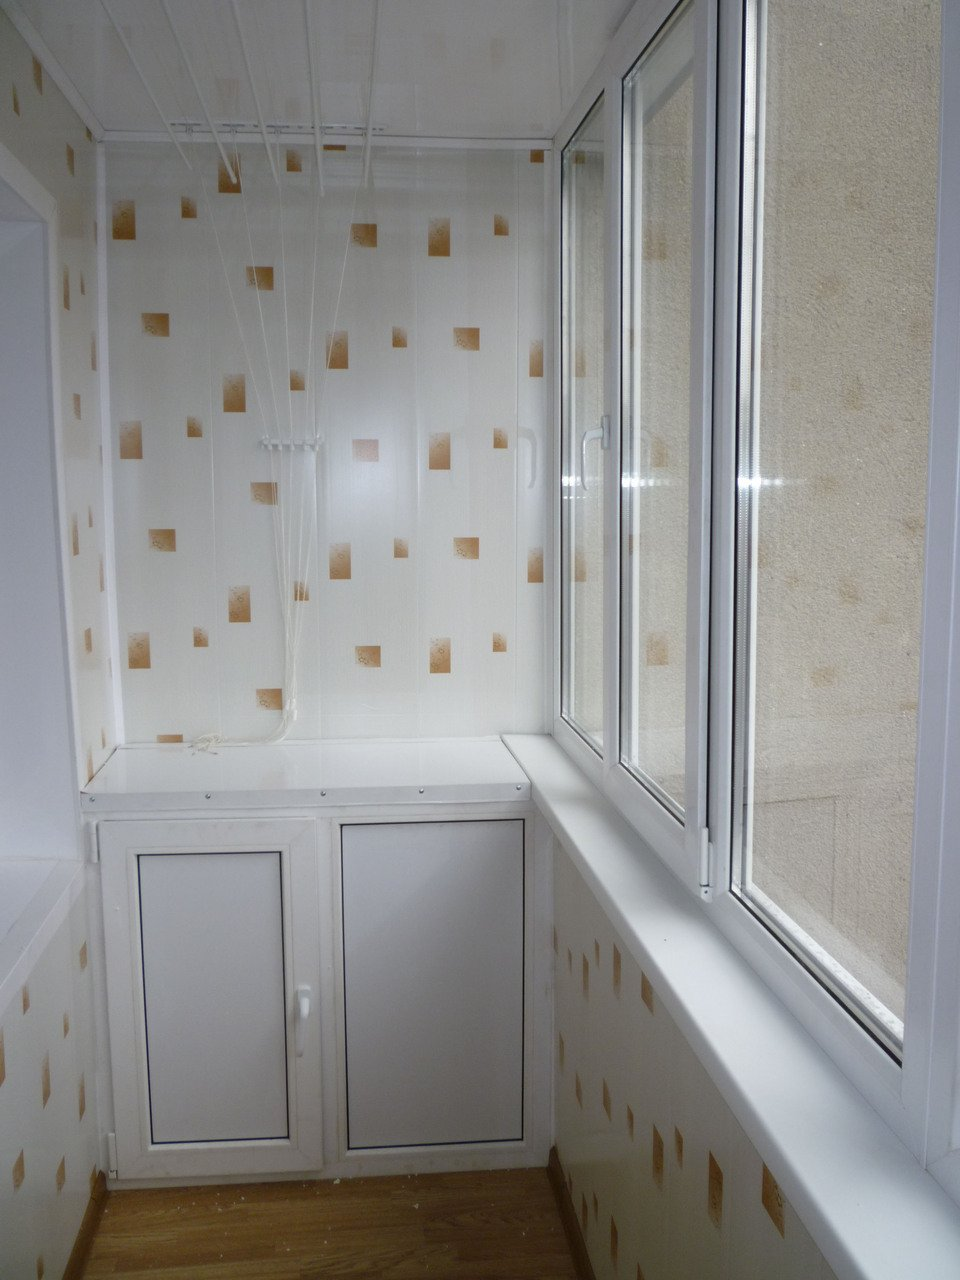 Обшивка балкона пластиковыми панелями: преимущества и качество